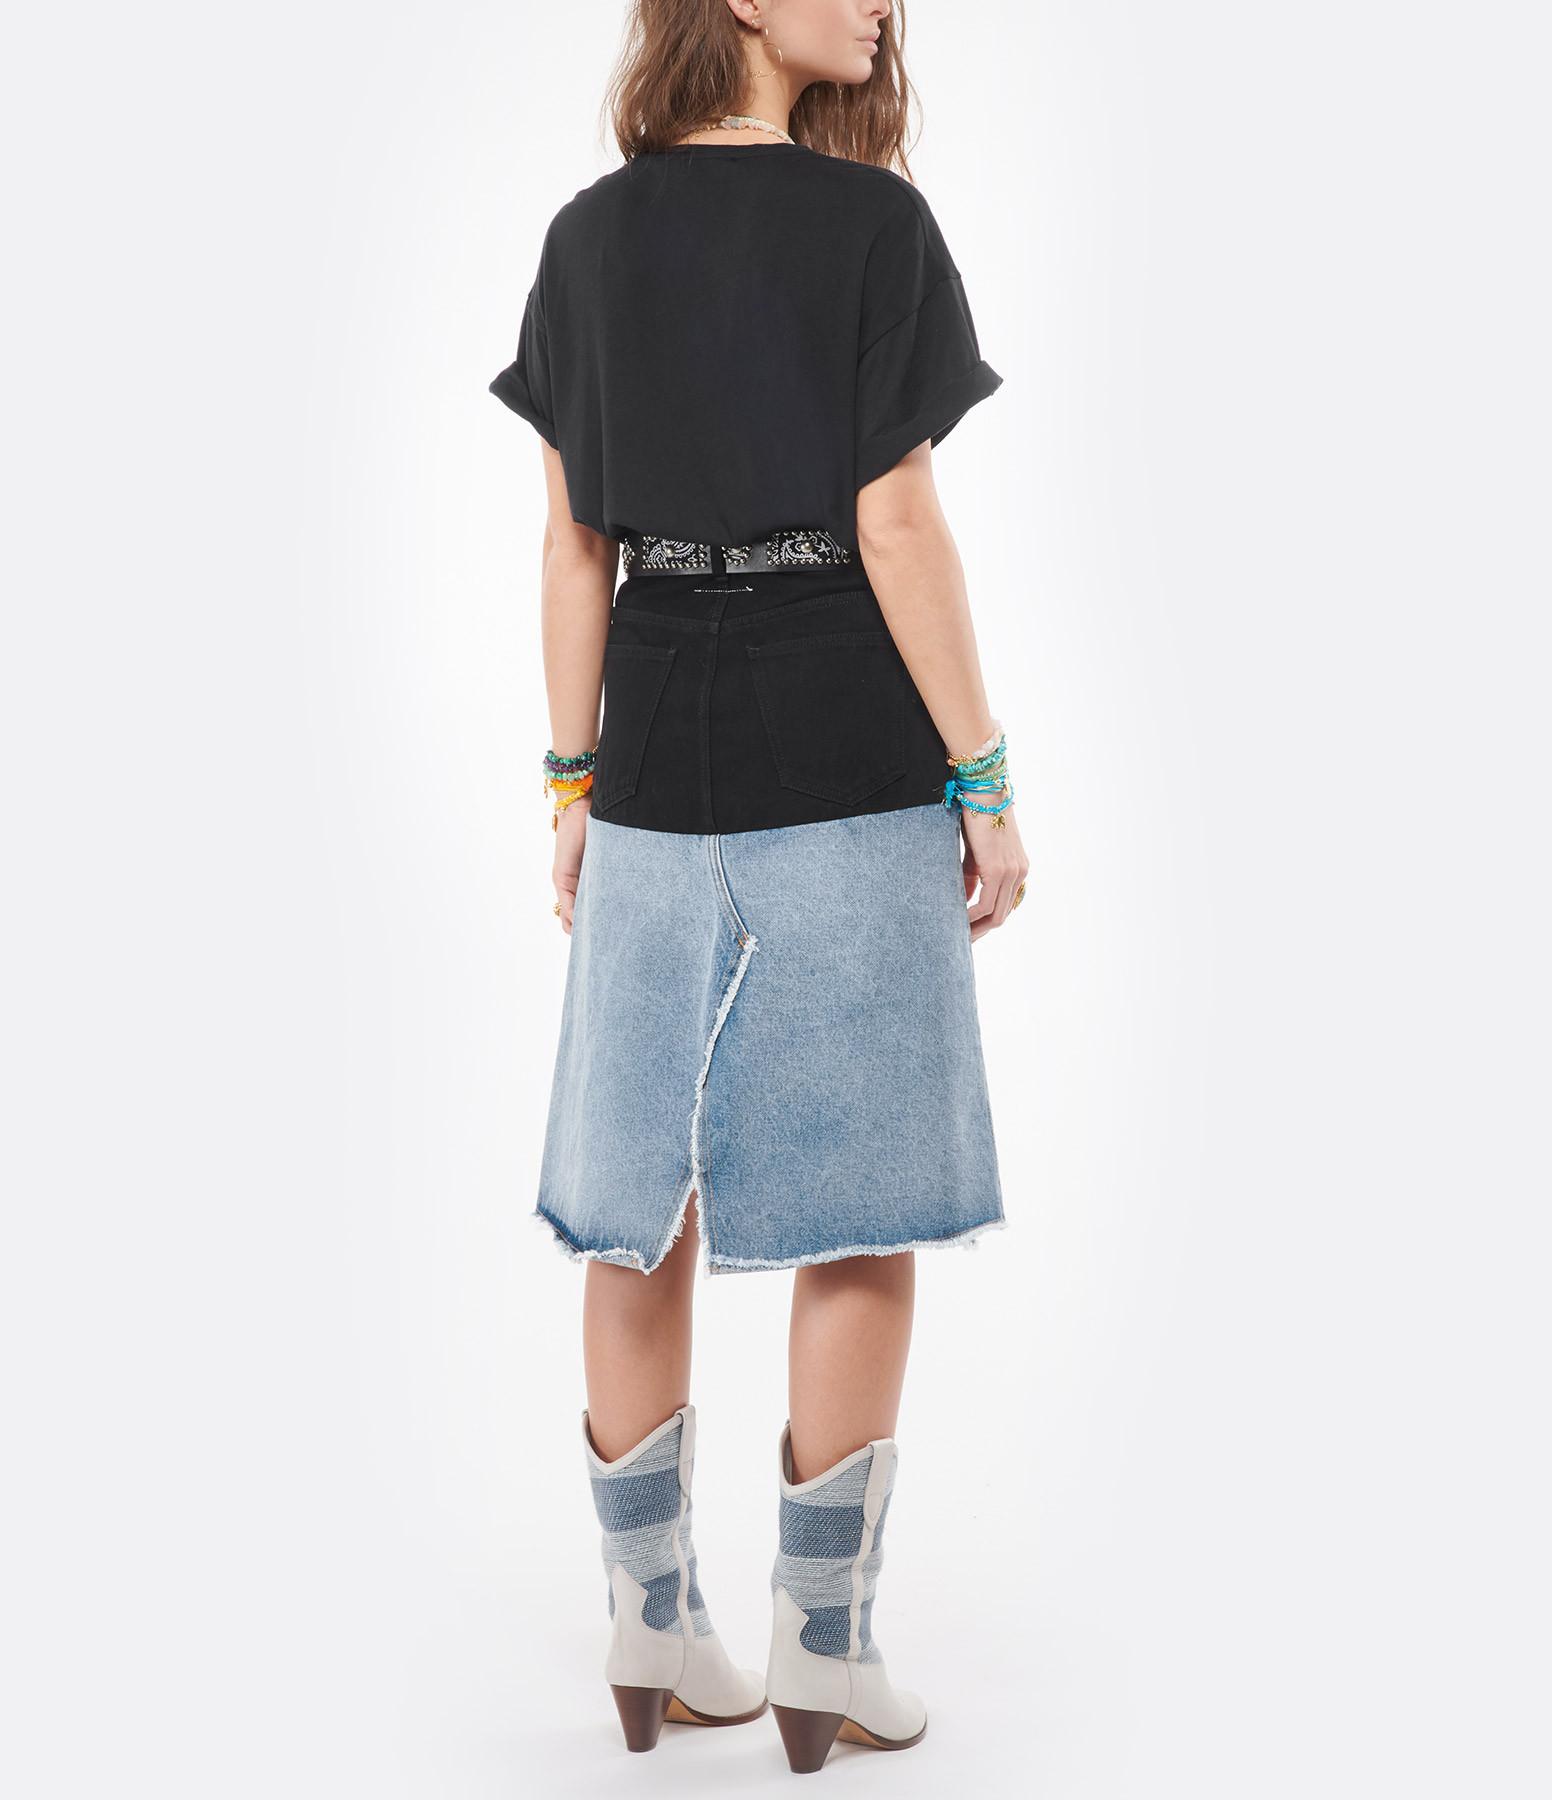 RAIINE - Tee-shirt Fox Coton Noir